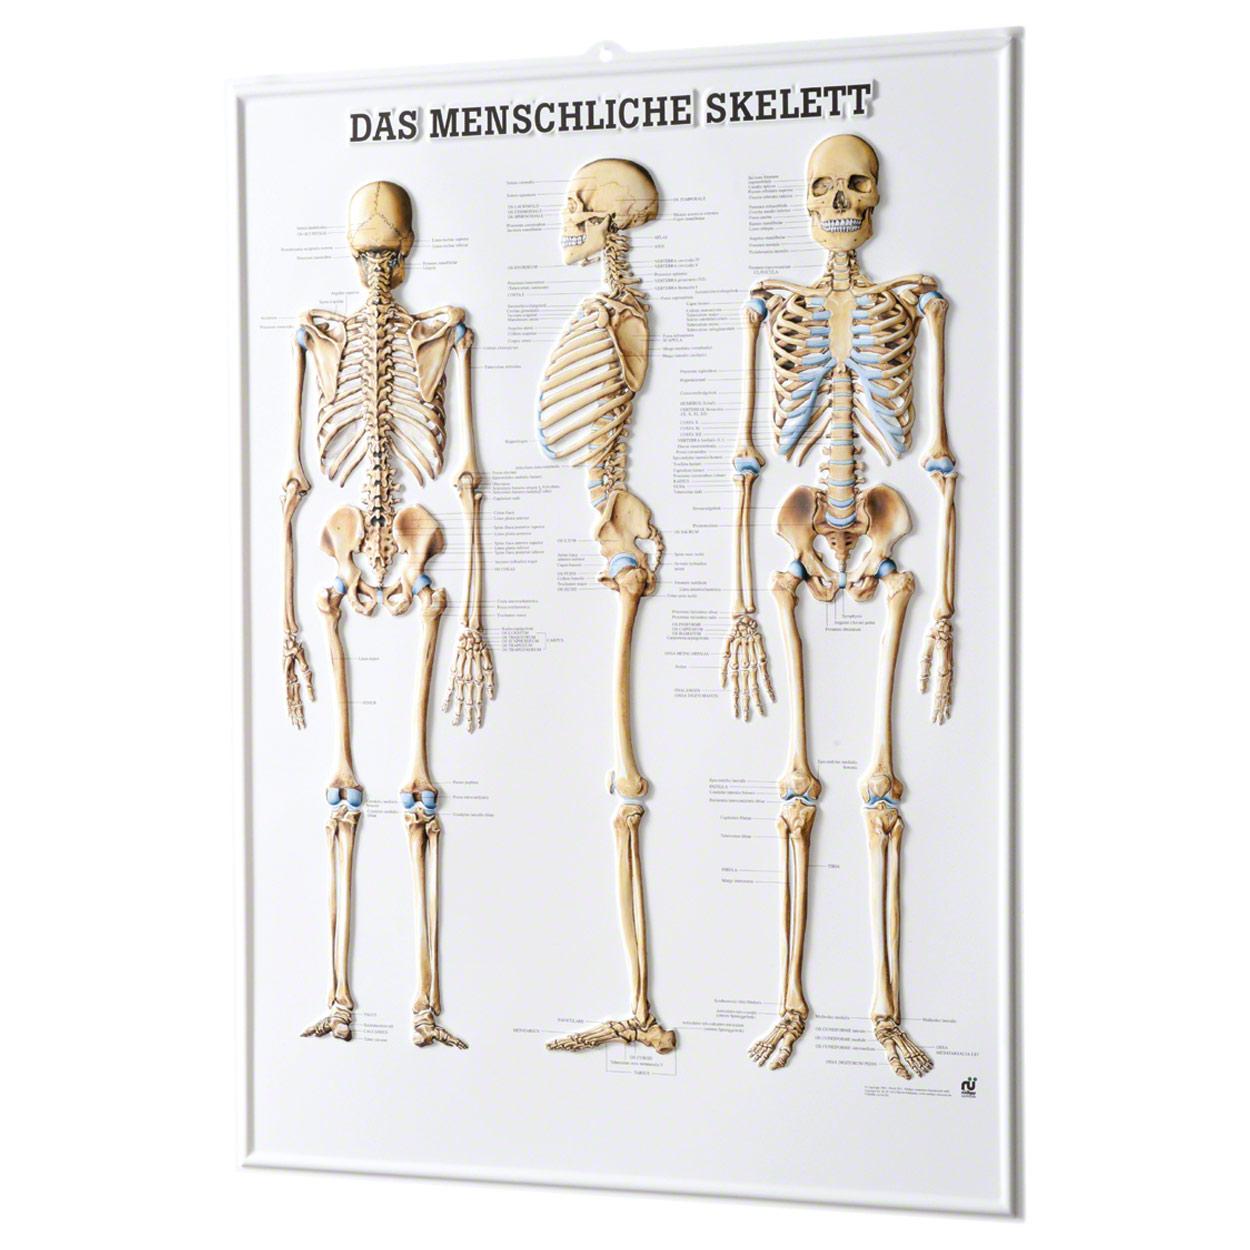 Relieftafel Das menschliche Skelett, LxB 74x54 cm - Sport-Tec.de ...